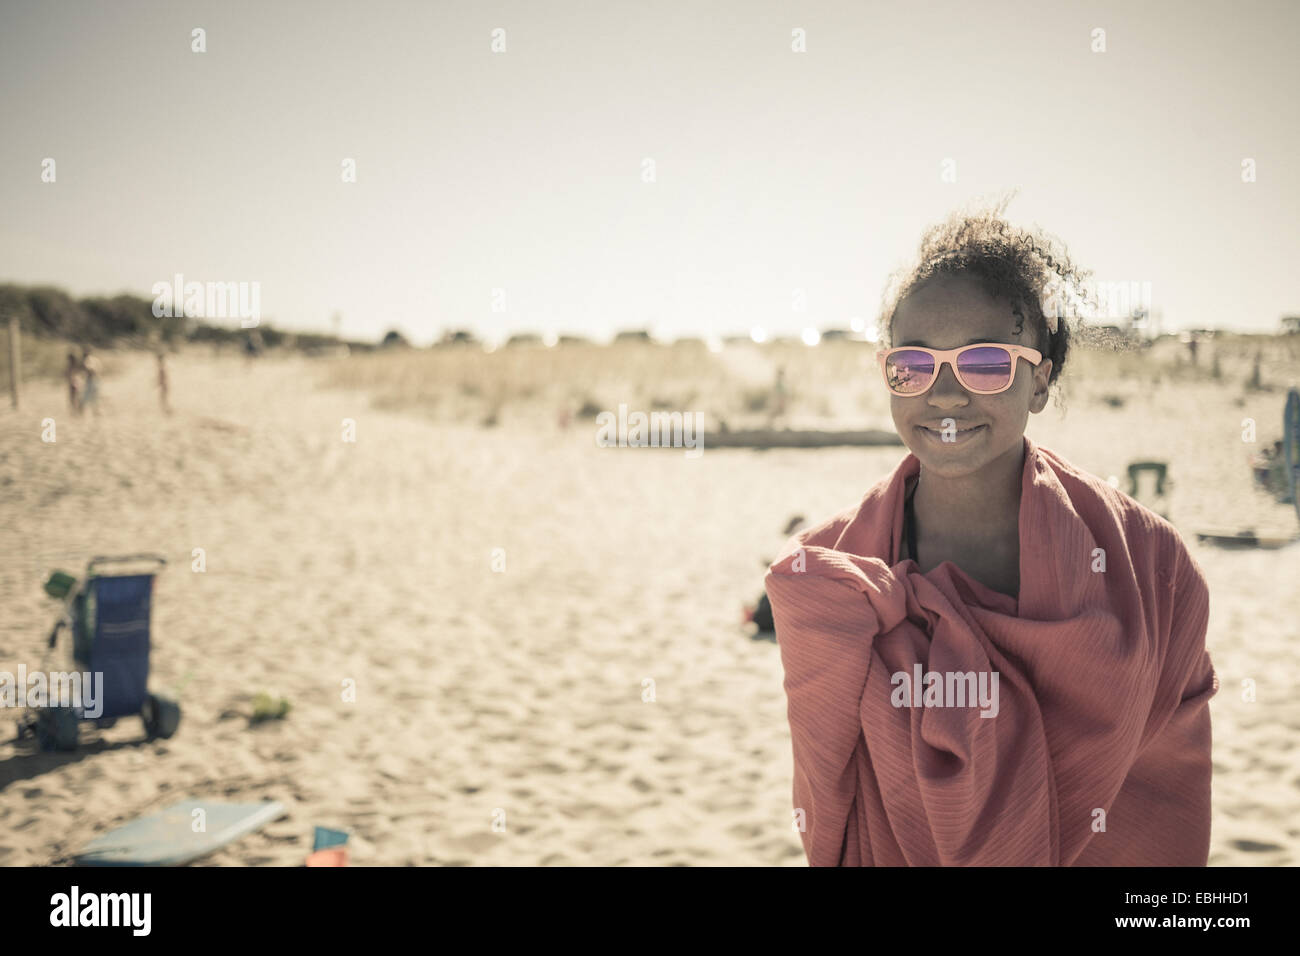 Niña envuelta en una toalla de playa, Truro, Cape Cod, Massachusetts, EE.UU. Imagen De Stock